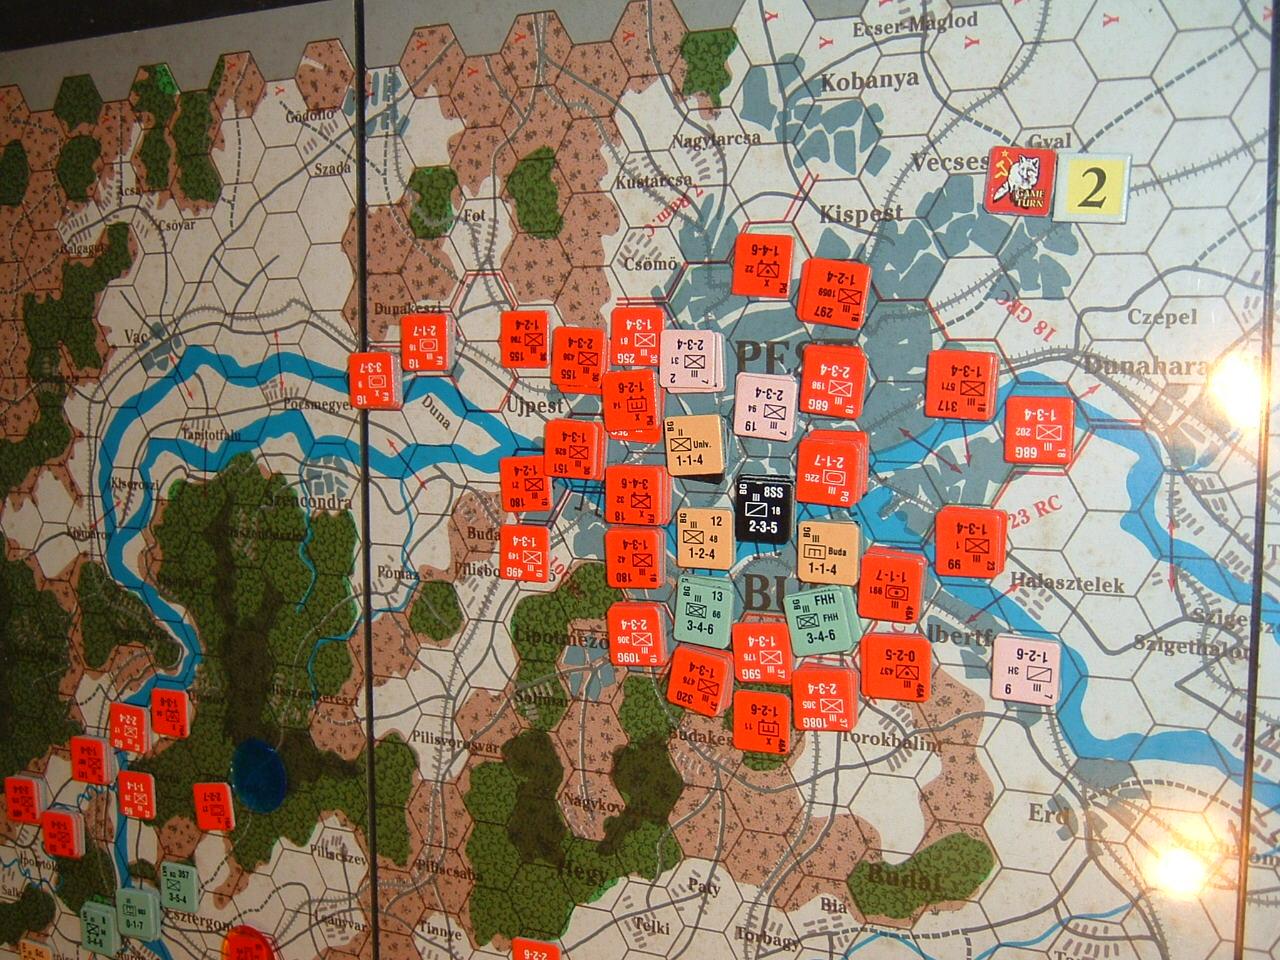 (HJ)ビターエンド/Bitter End ブダペスト救出作戦プレイしました_b0173672_21331847.jpg